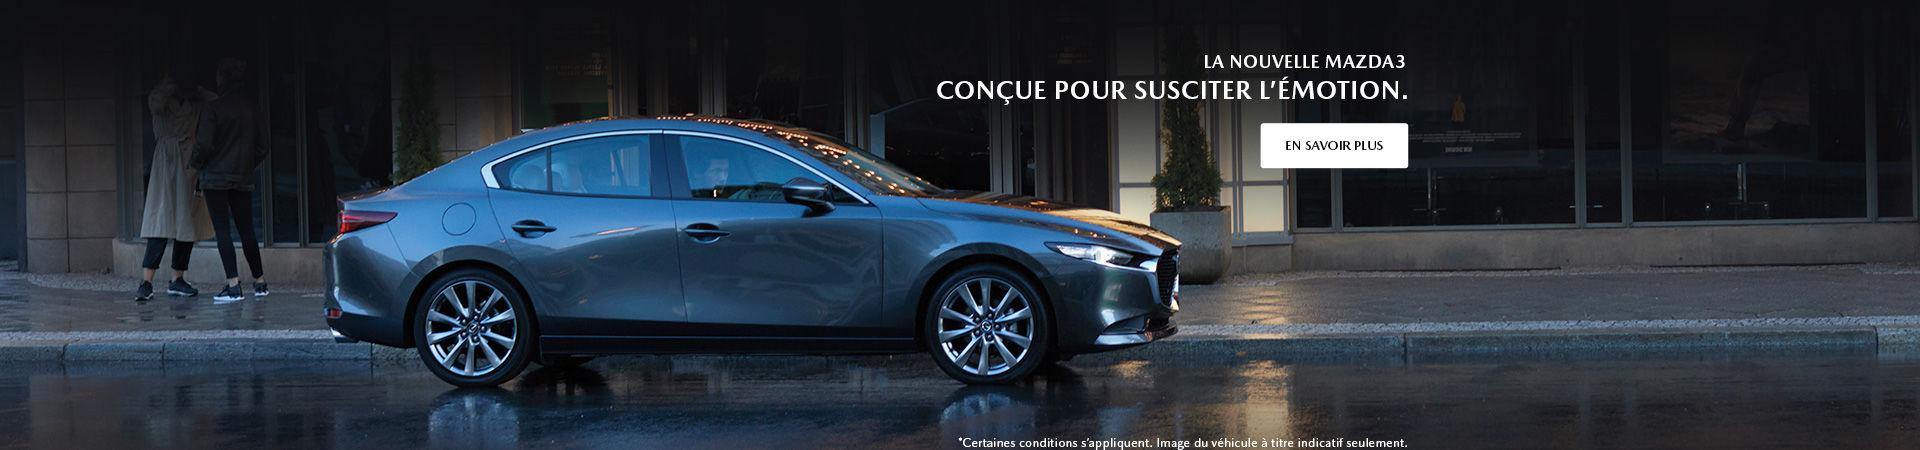 The All-New Mazda3